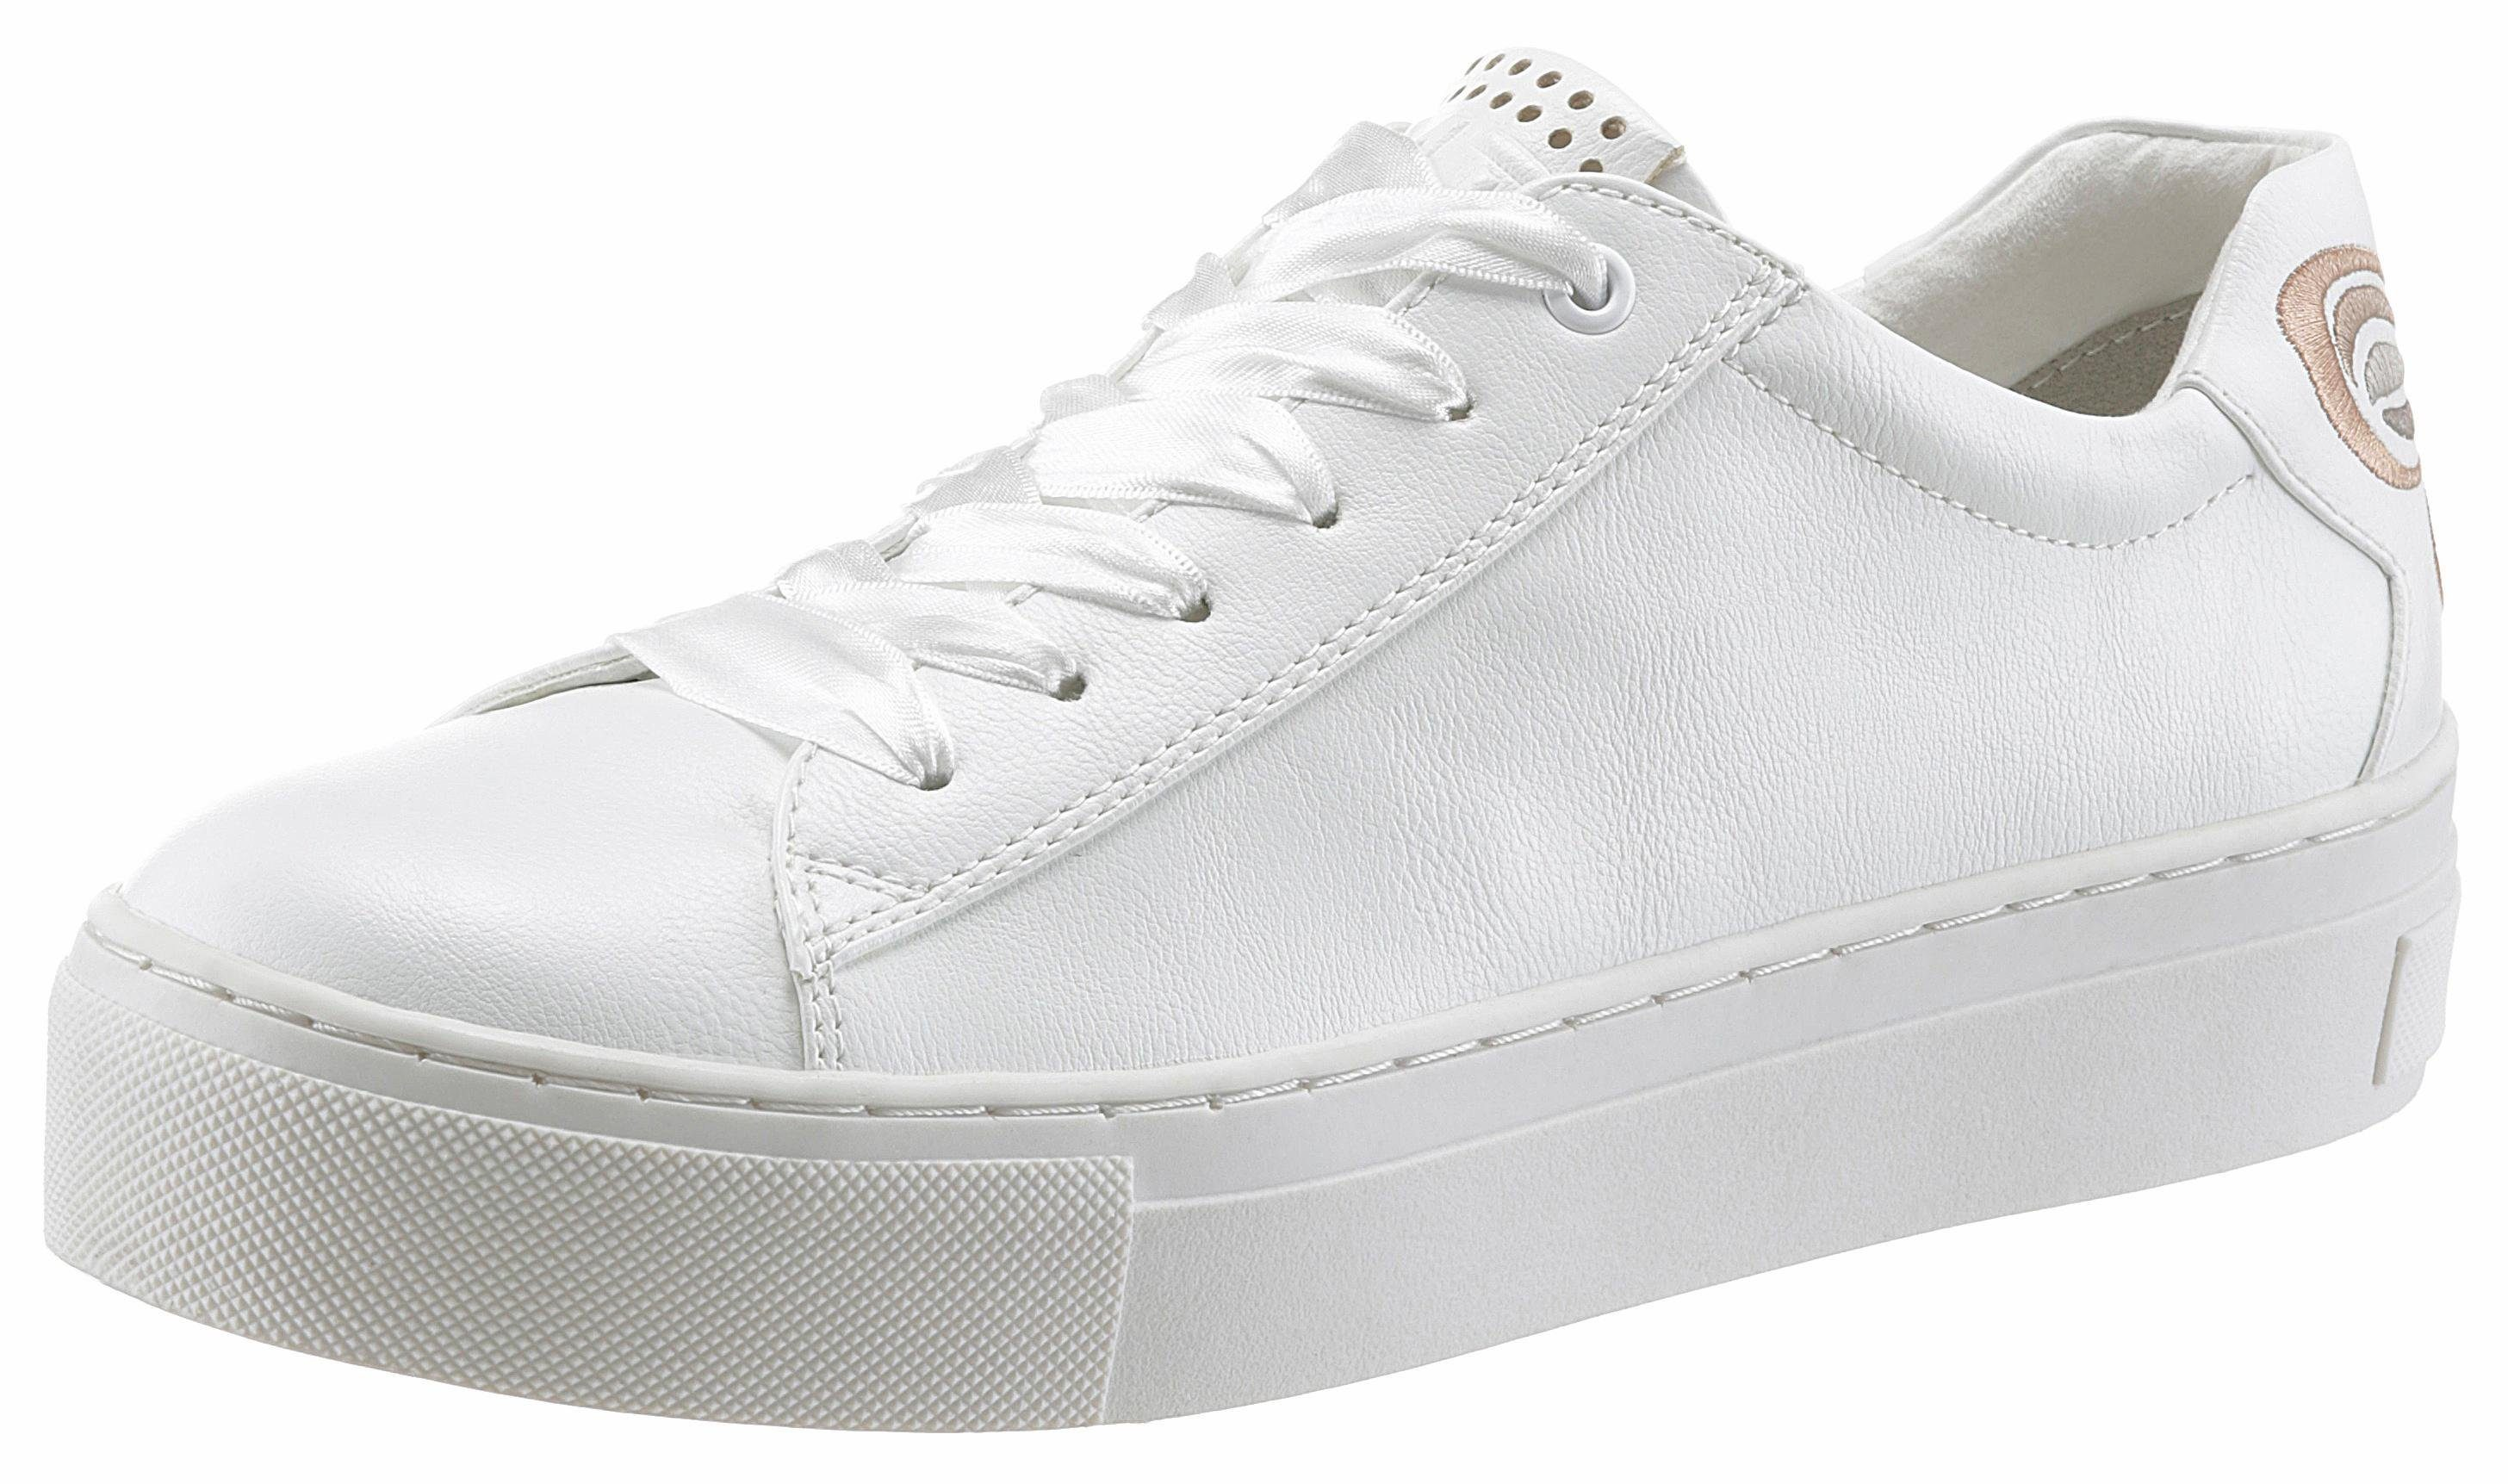 Marco Tozzi Baskets Blanc - Femmes - Taille 39 vIE9vOf